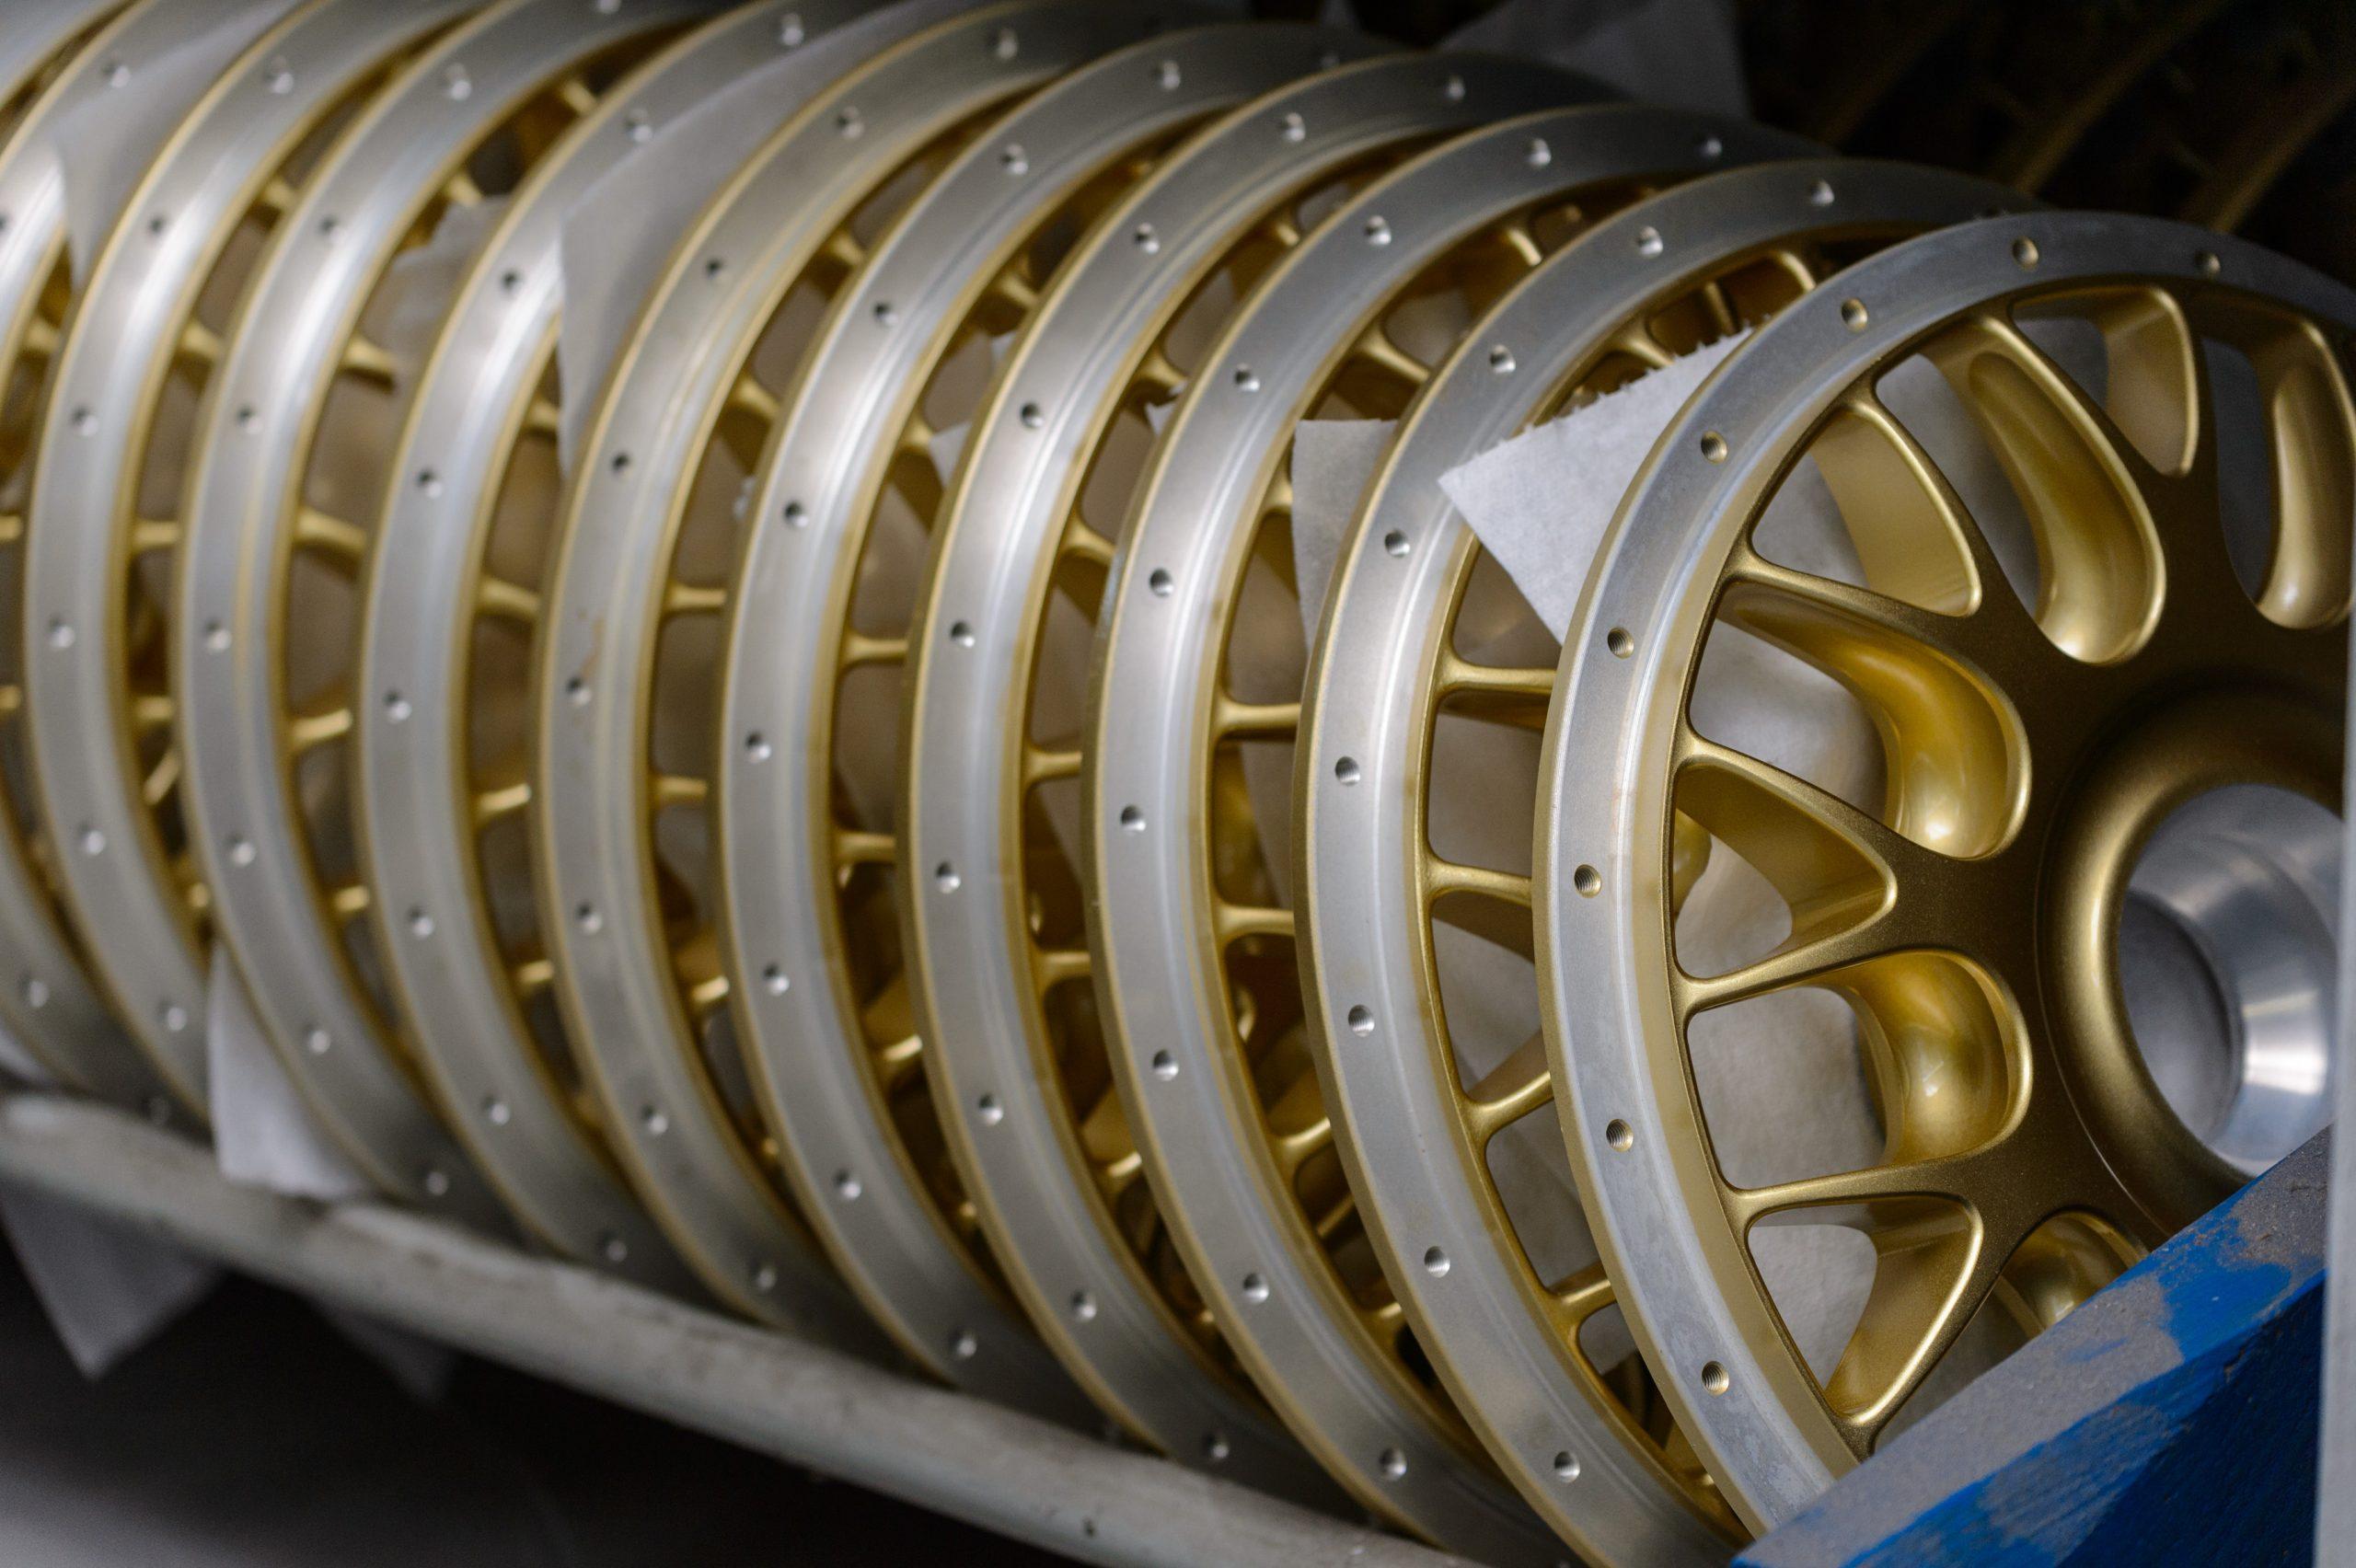 bbs wheel parts